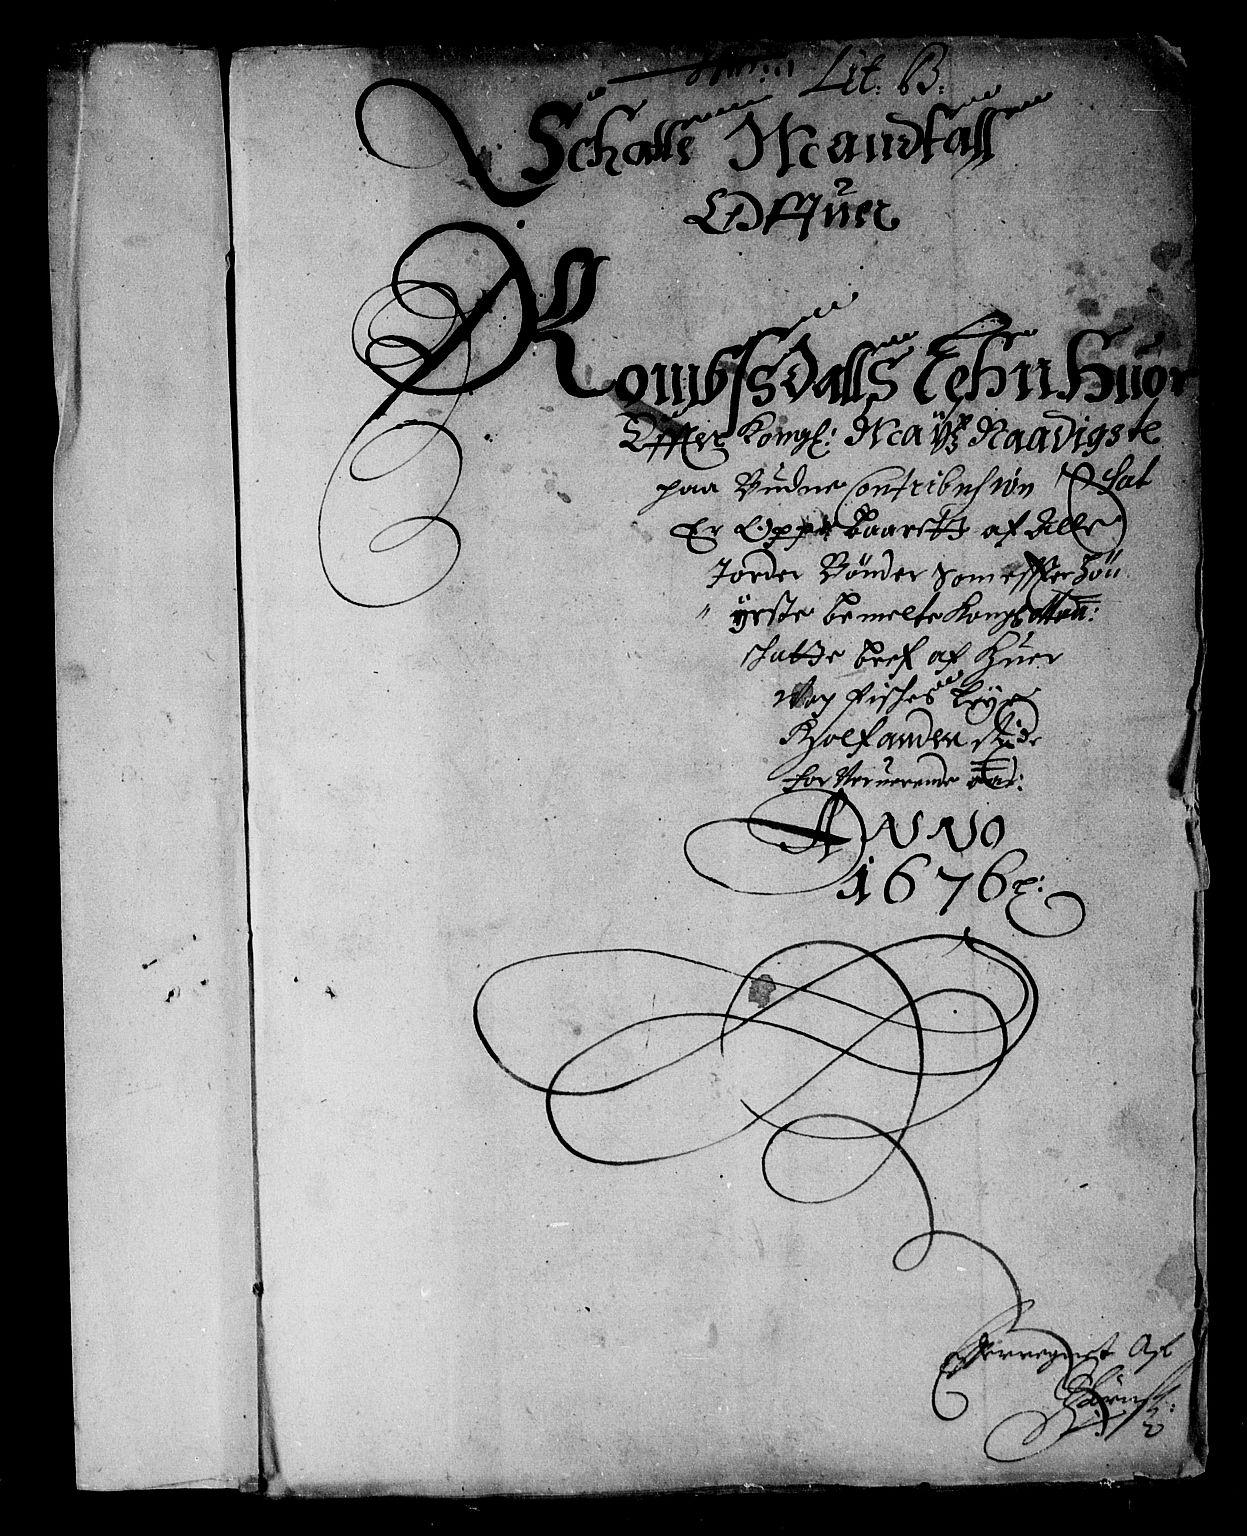 RA, Rentekammeret inntil 1814, Reviderte regnskaper, Stiftamtstueregnskaper, Trondheim stiftamt og Nordland amt, R/Rd/L0043: Trondheim stiftamt, 1676